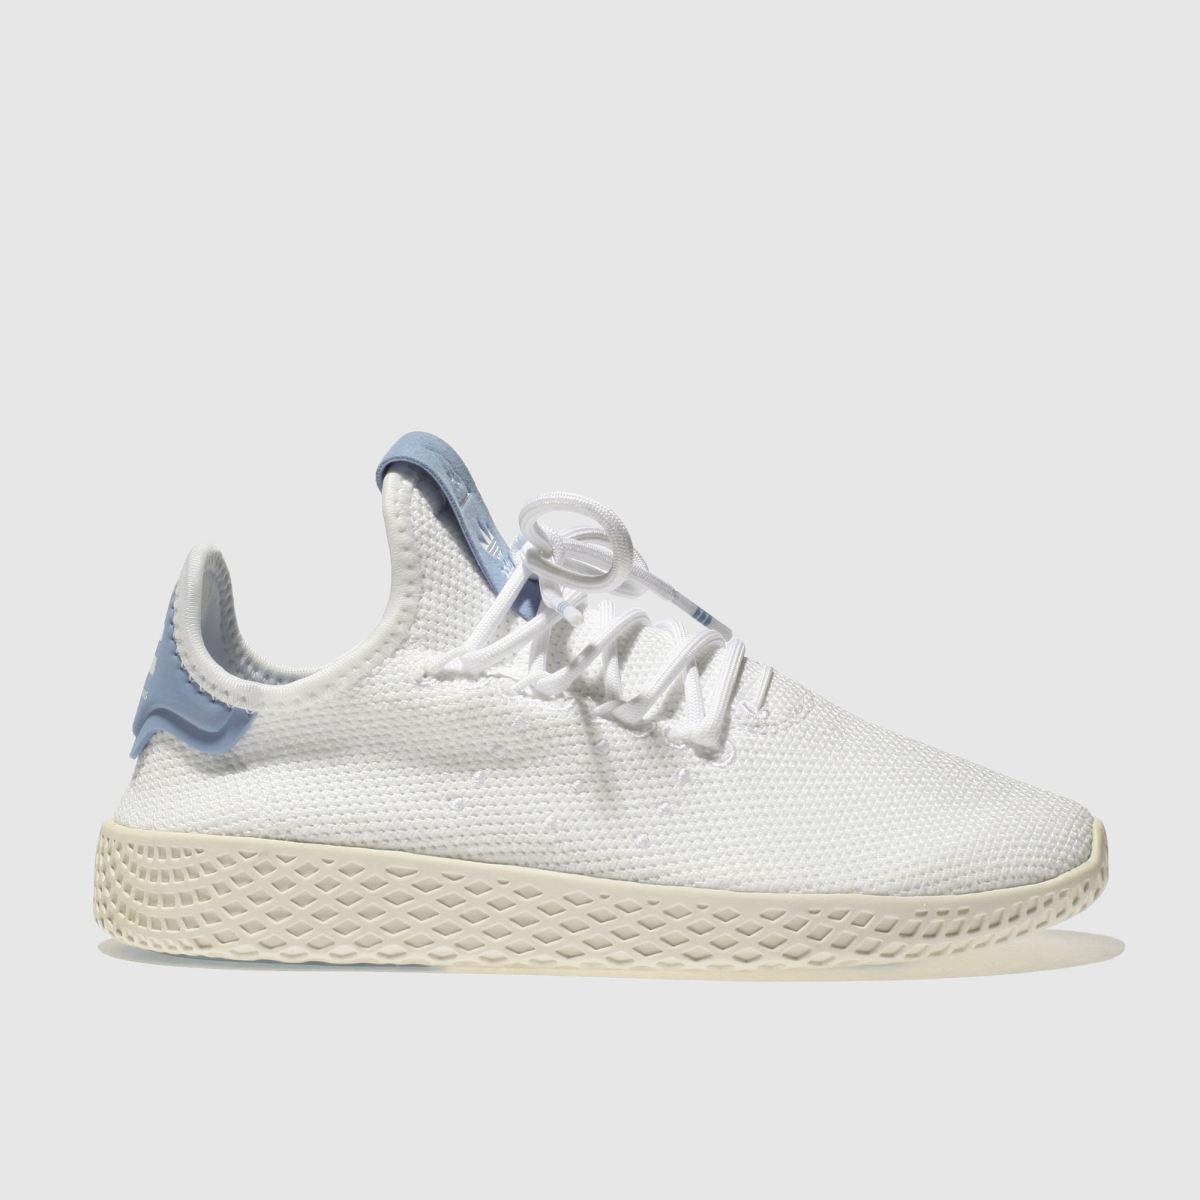 Adidas White & Blue Pharrell Williams Tennis Hu Unisex Youth Youth